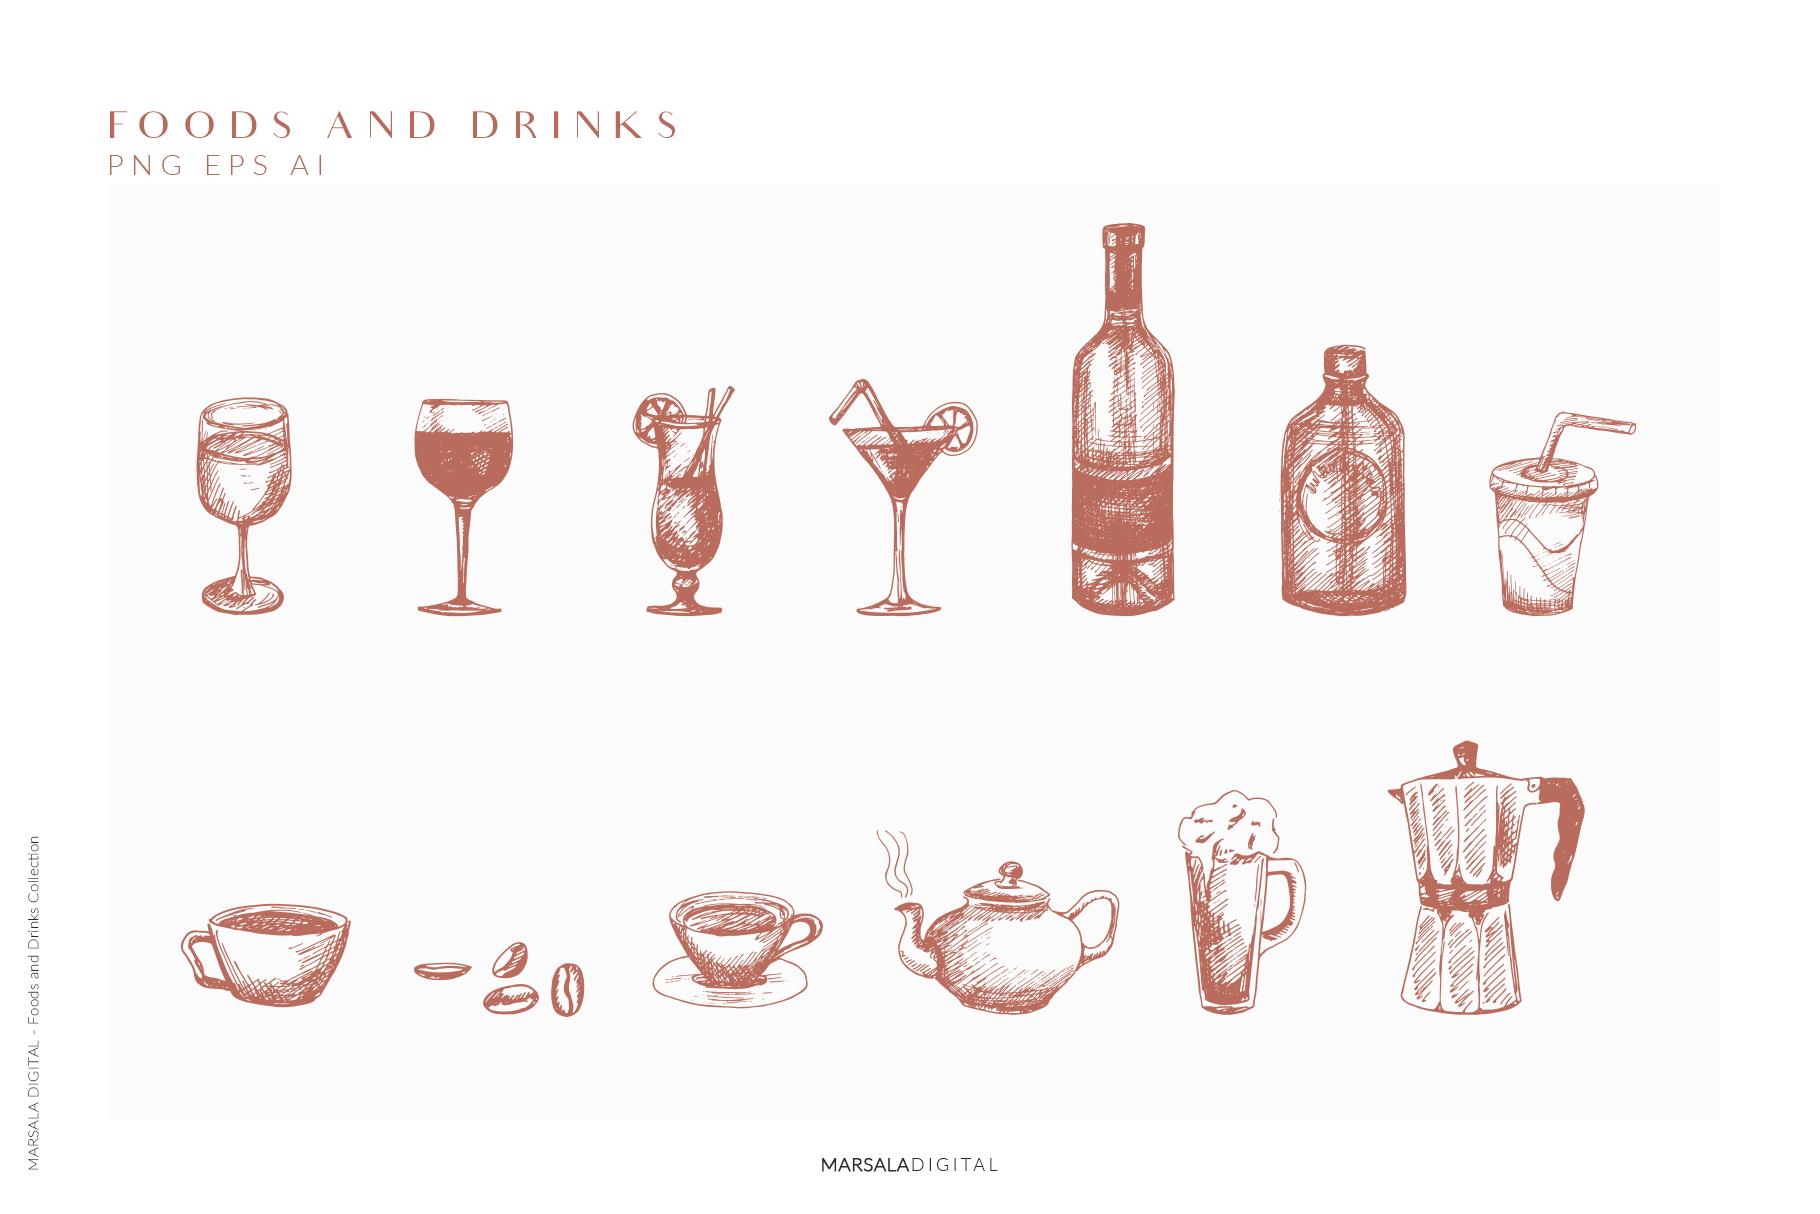 Foods & Drinks Logo Elements Handrawn Graphics example image 2